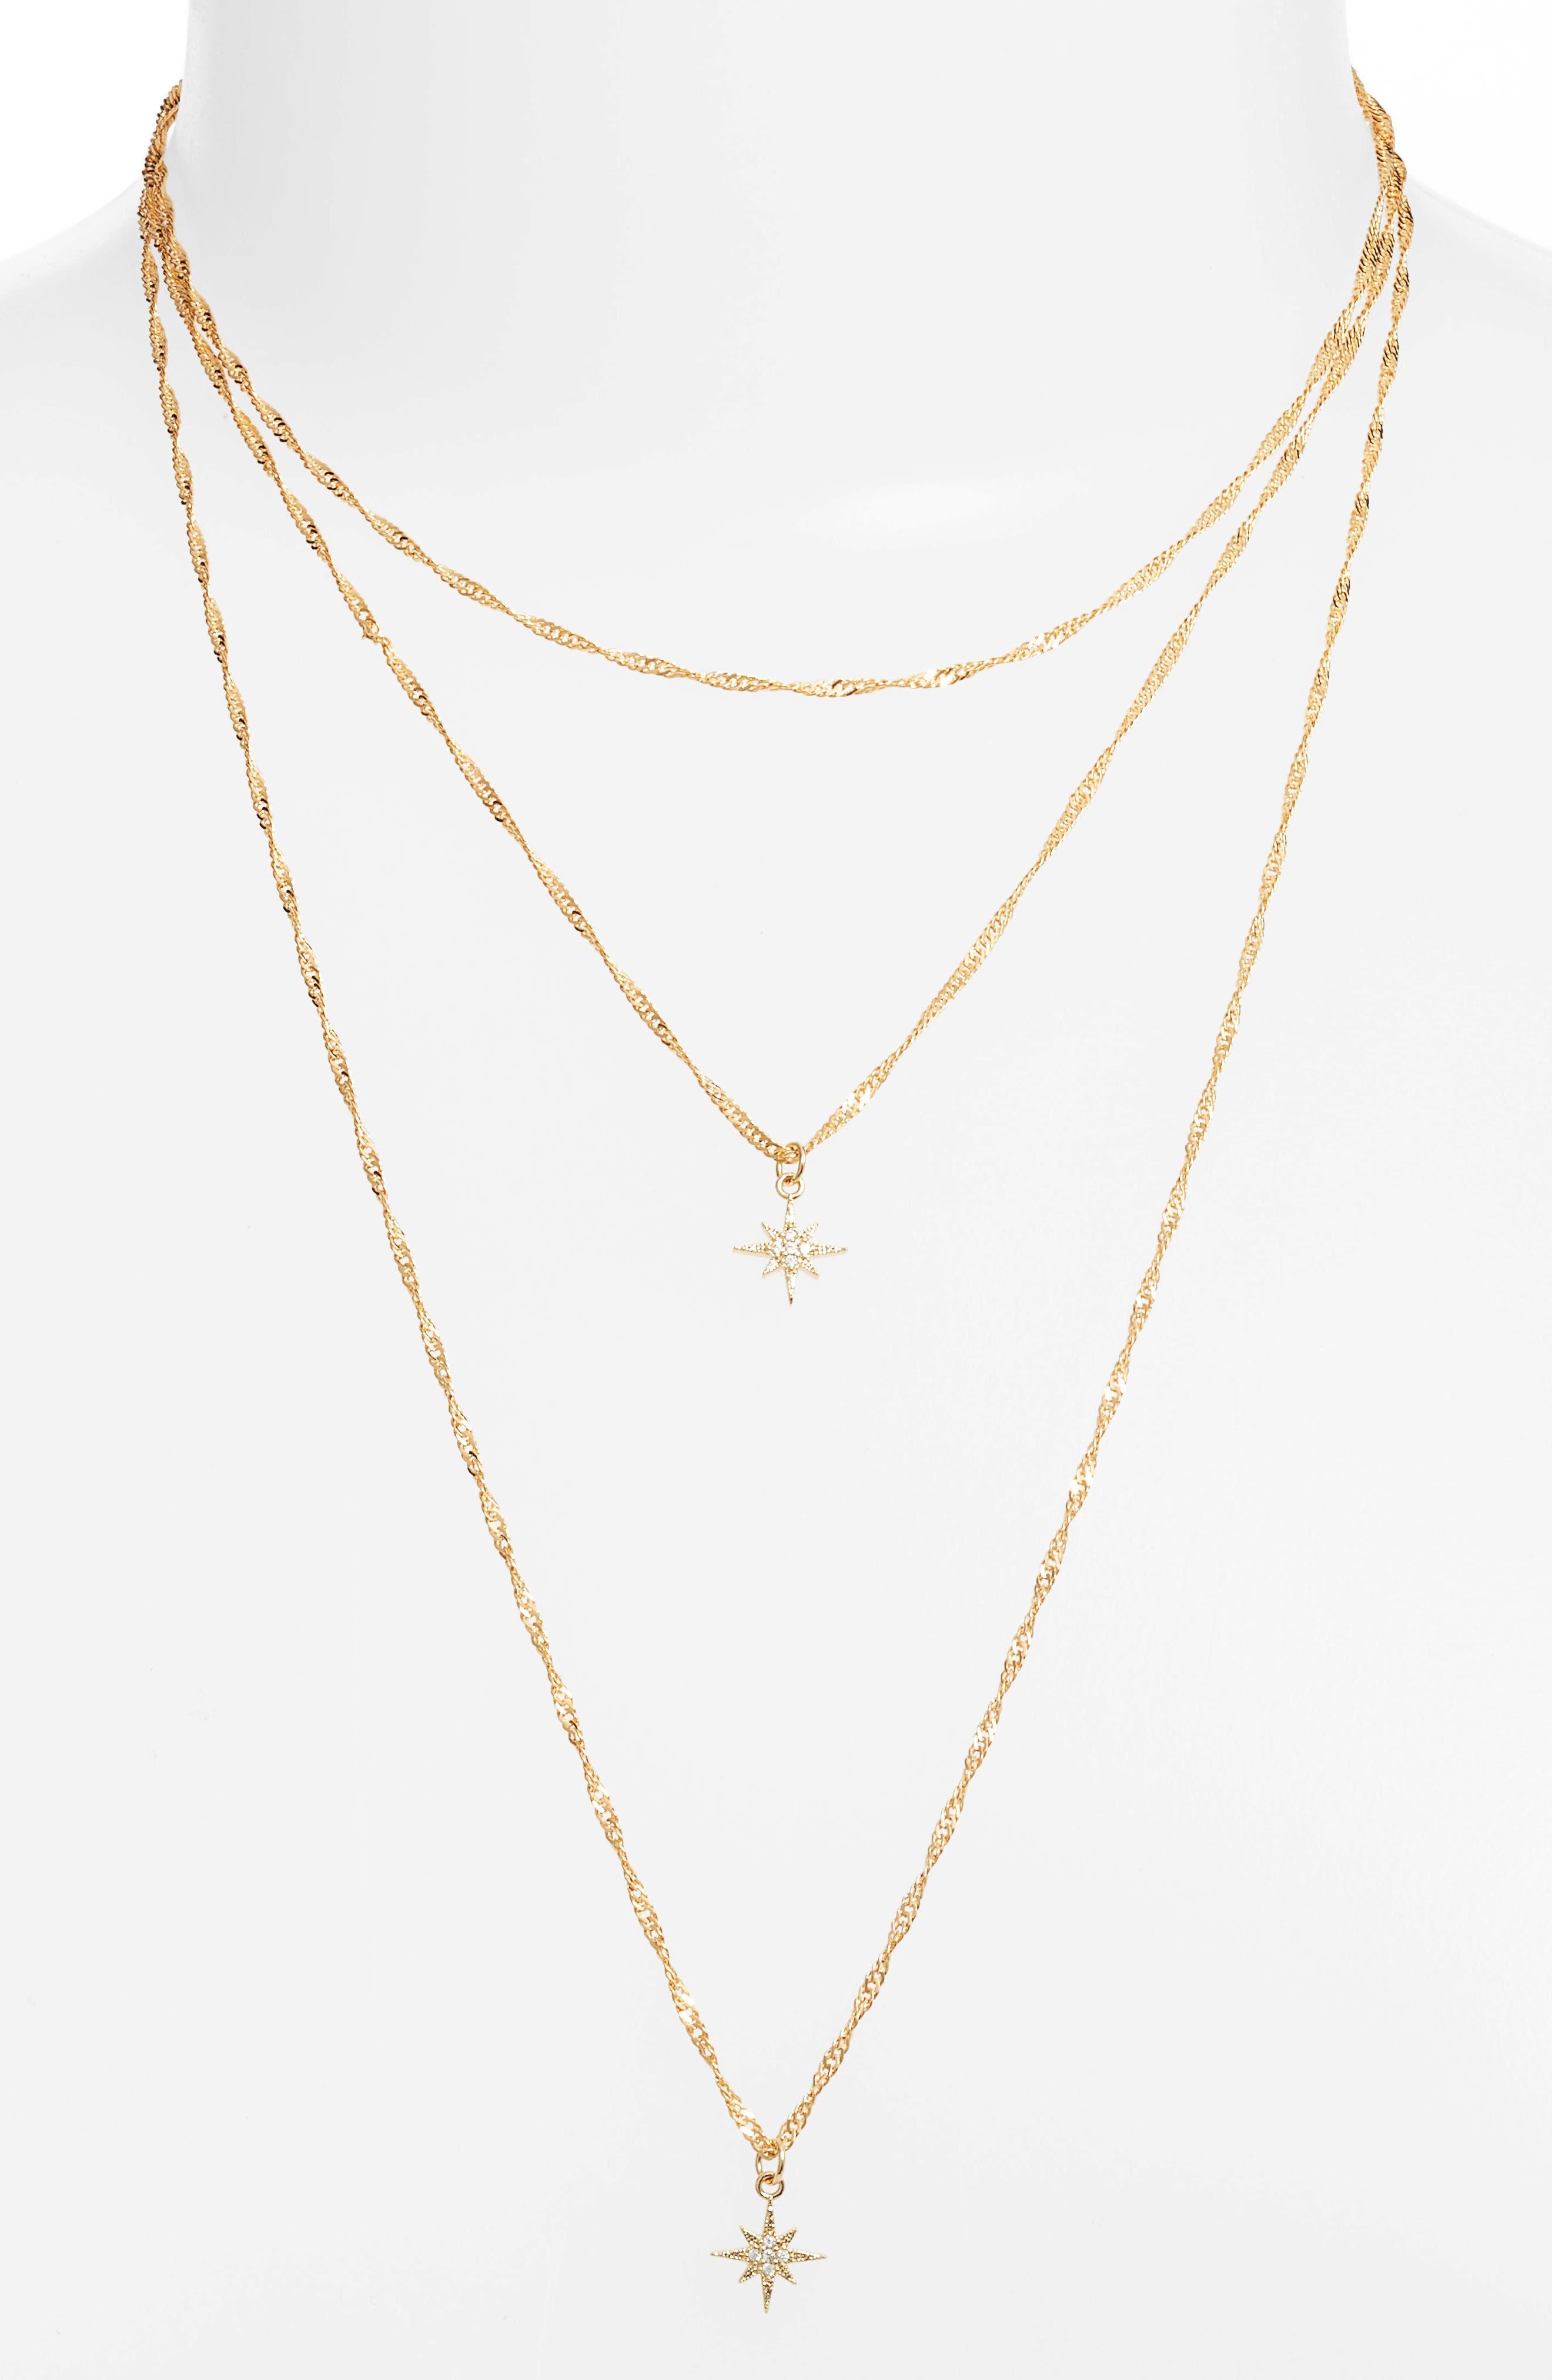 Yolanda Layered Necklace,                         Main,                         color, GOLD